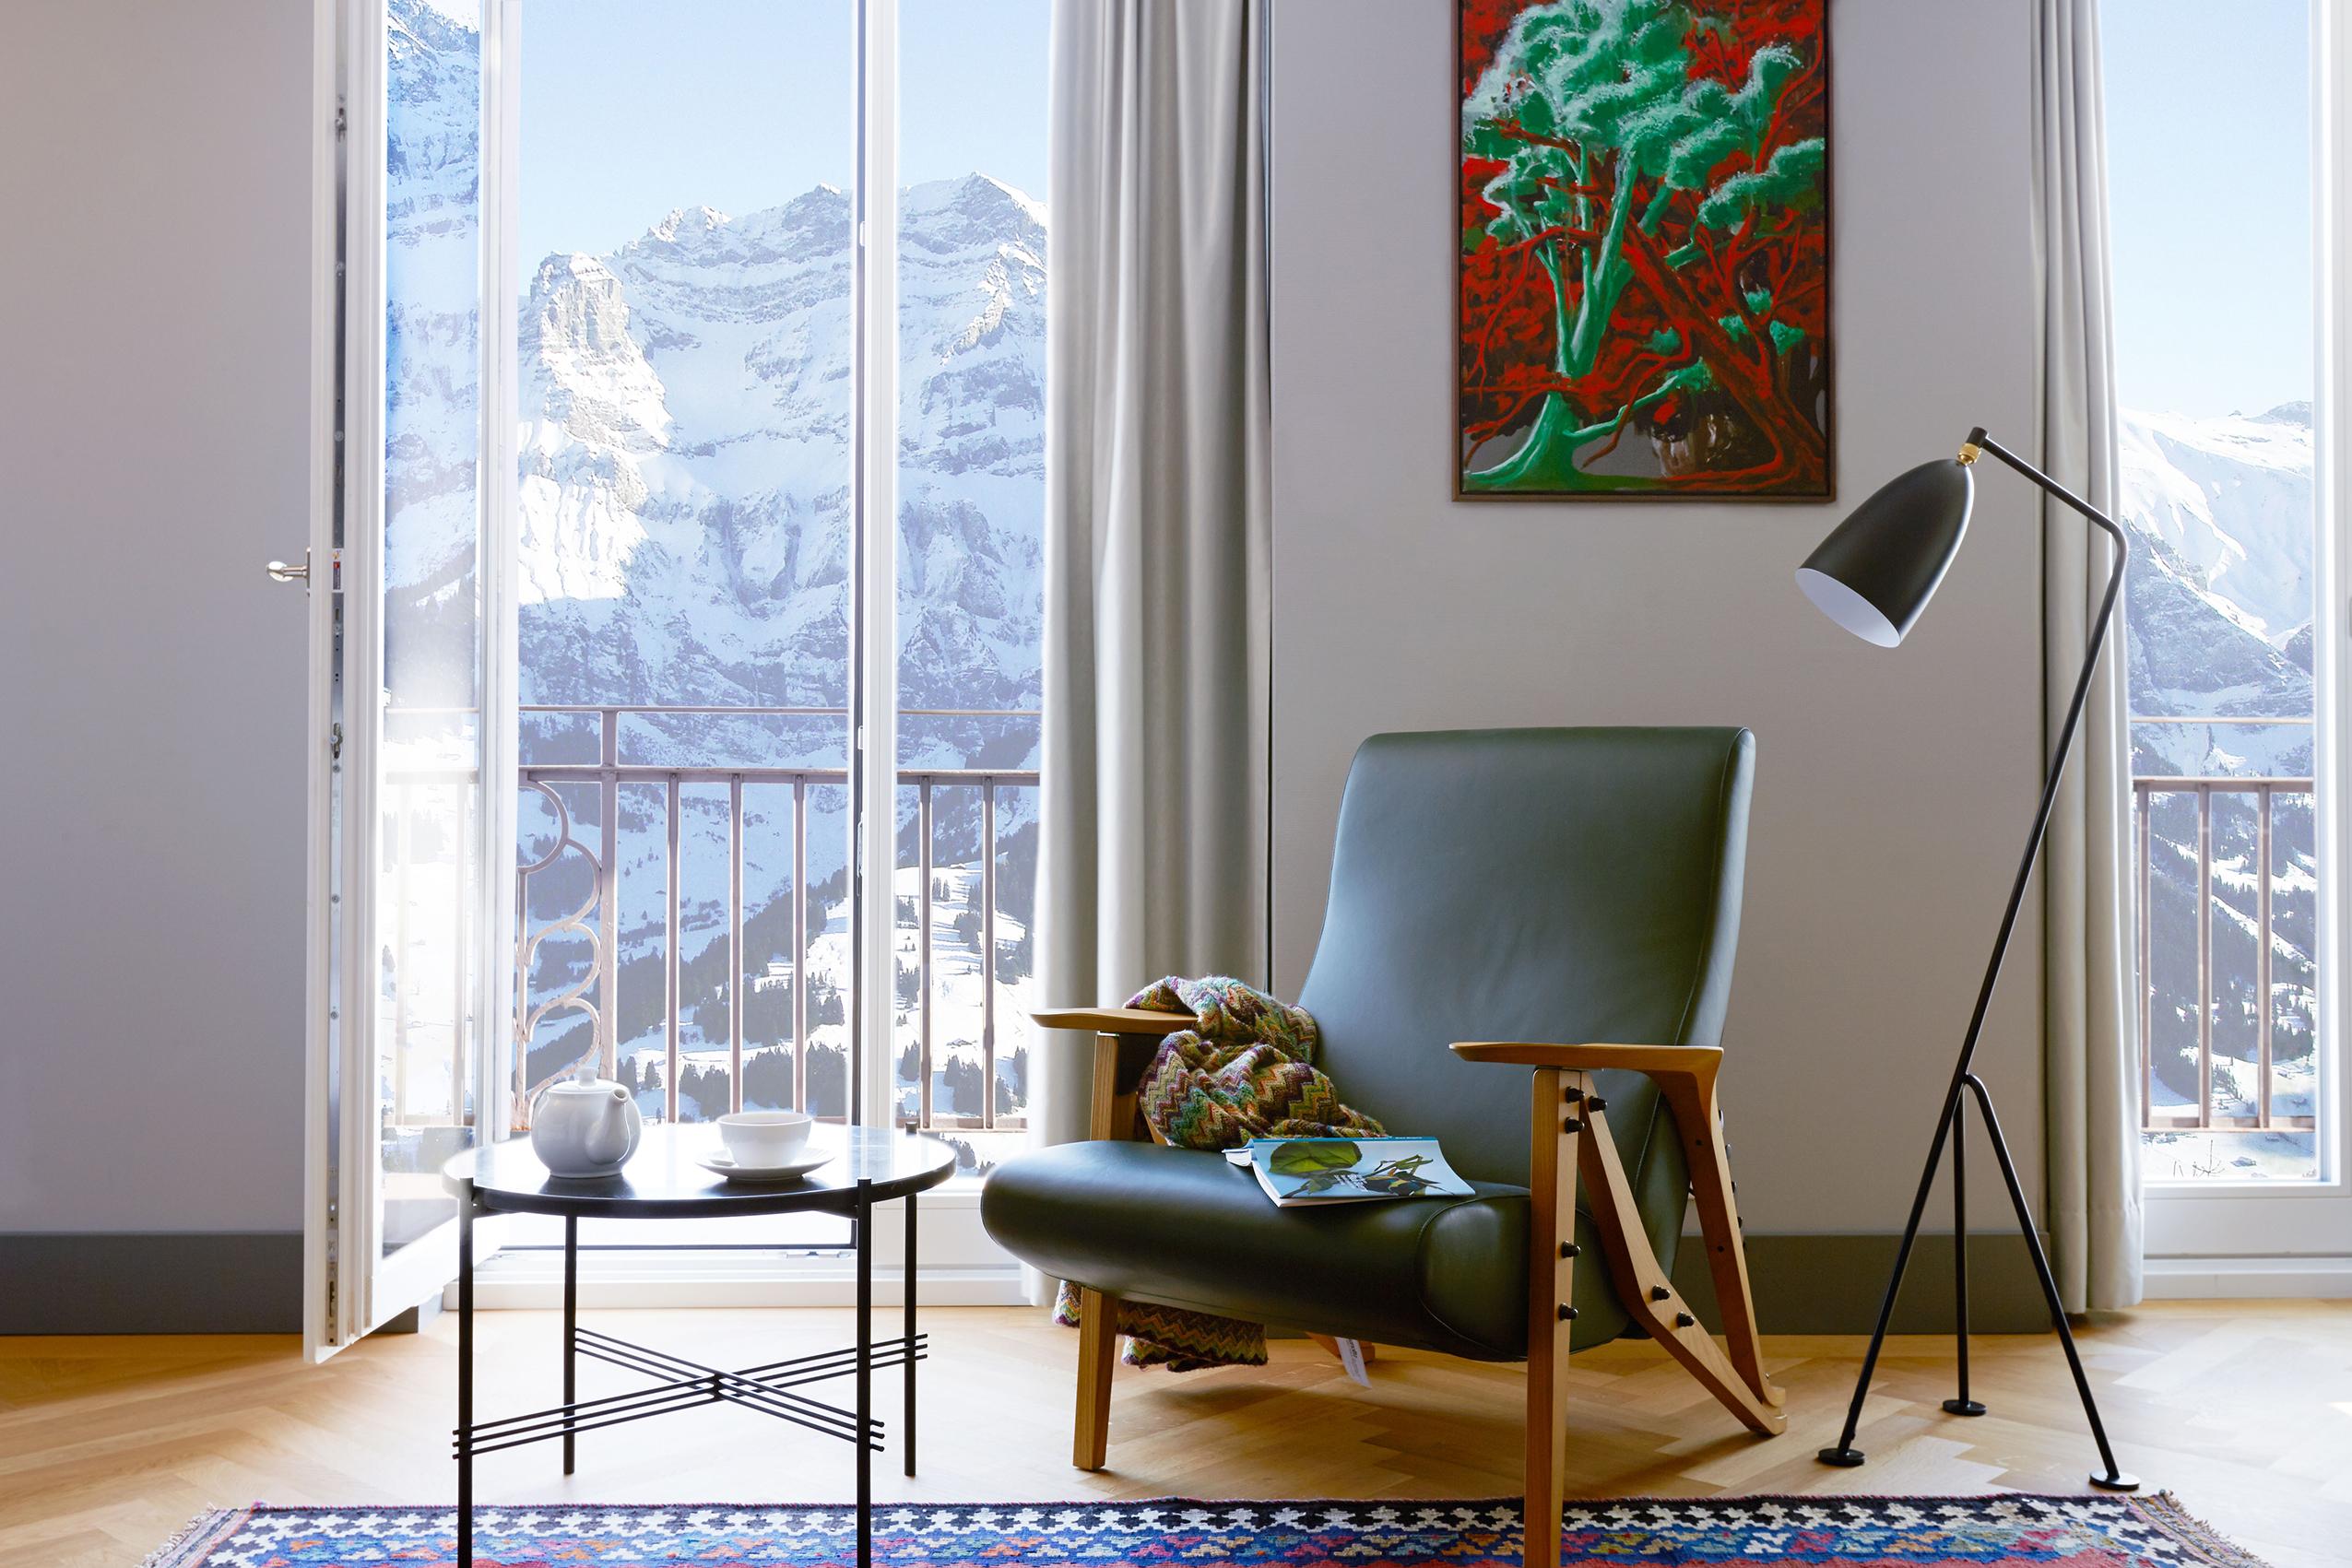 Bellevue Parkhotel & Spa Adelboden, pressemittelung tn hotel media consulting, silicone, bauhaus